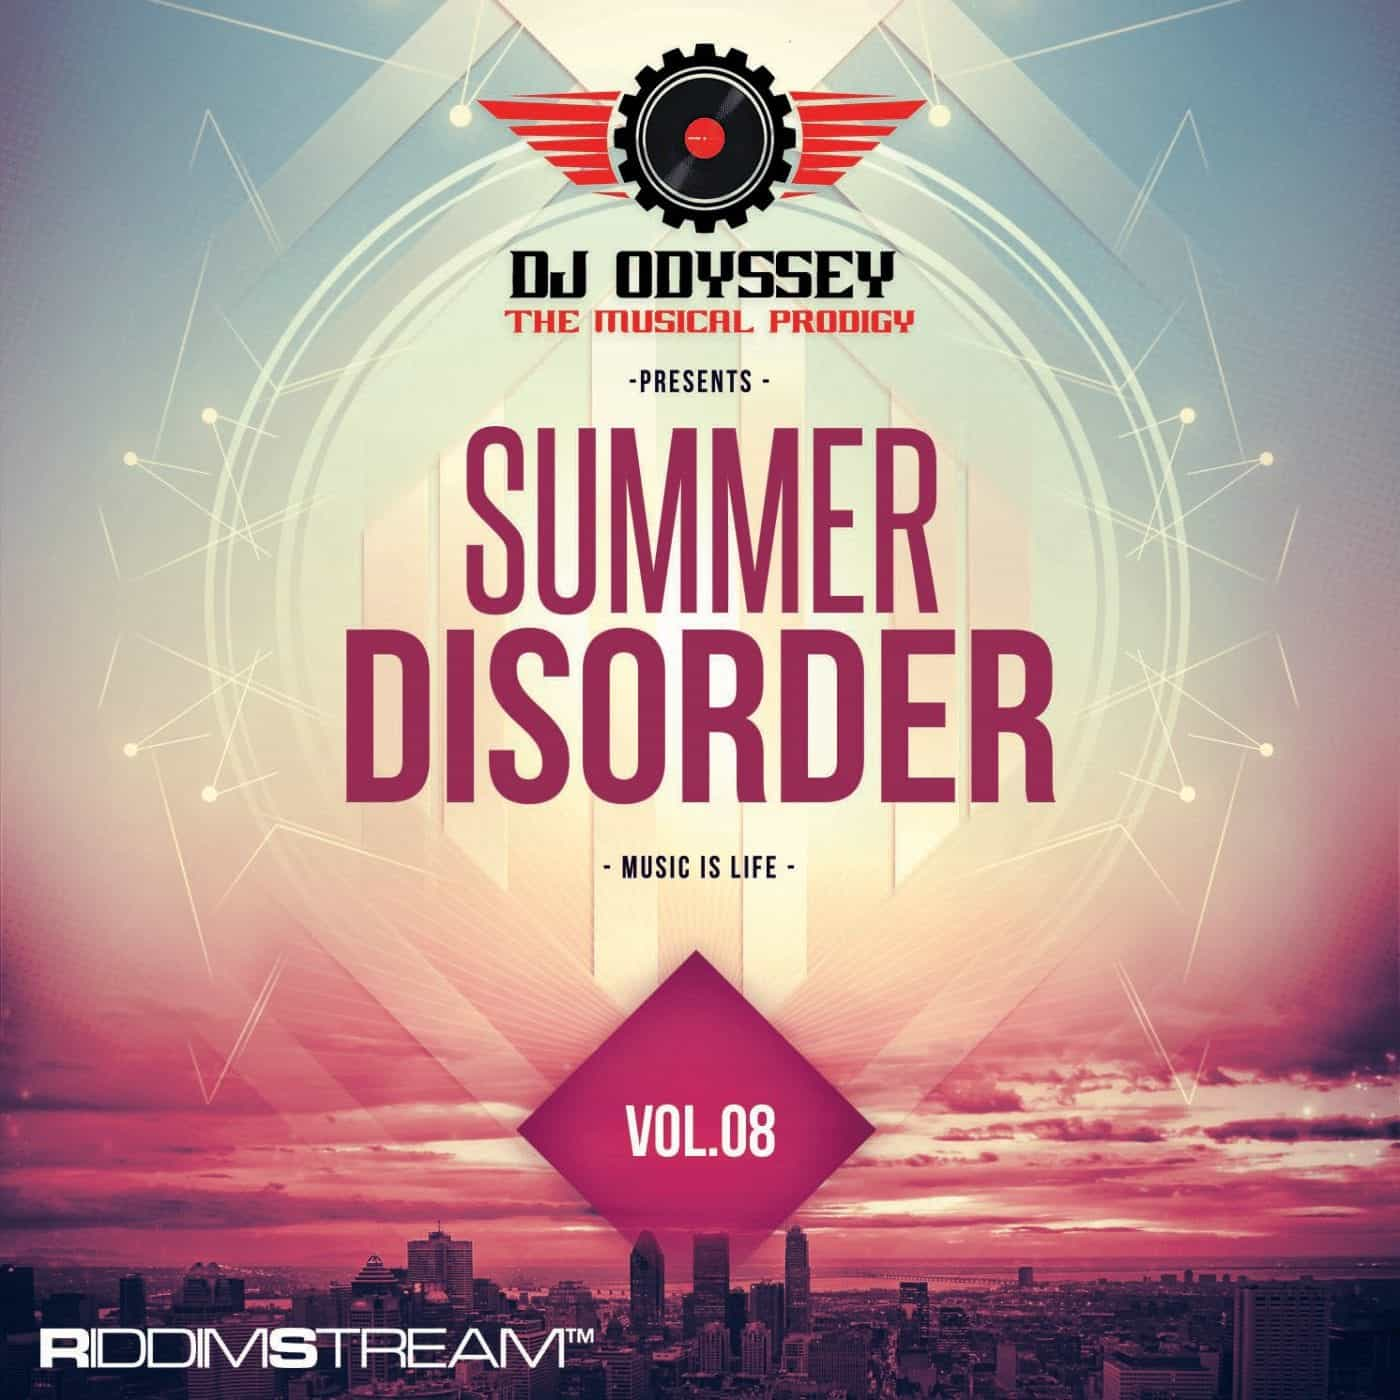 Dj Oddyssey - Summer Disorder Music is Life Vol. 8